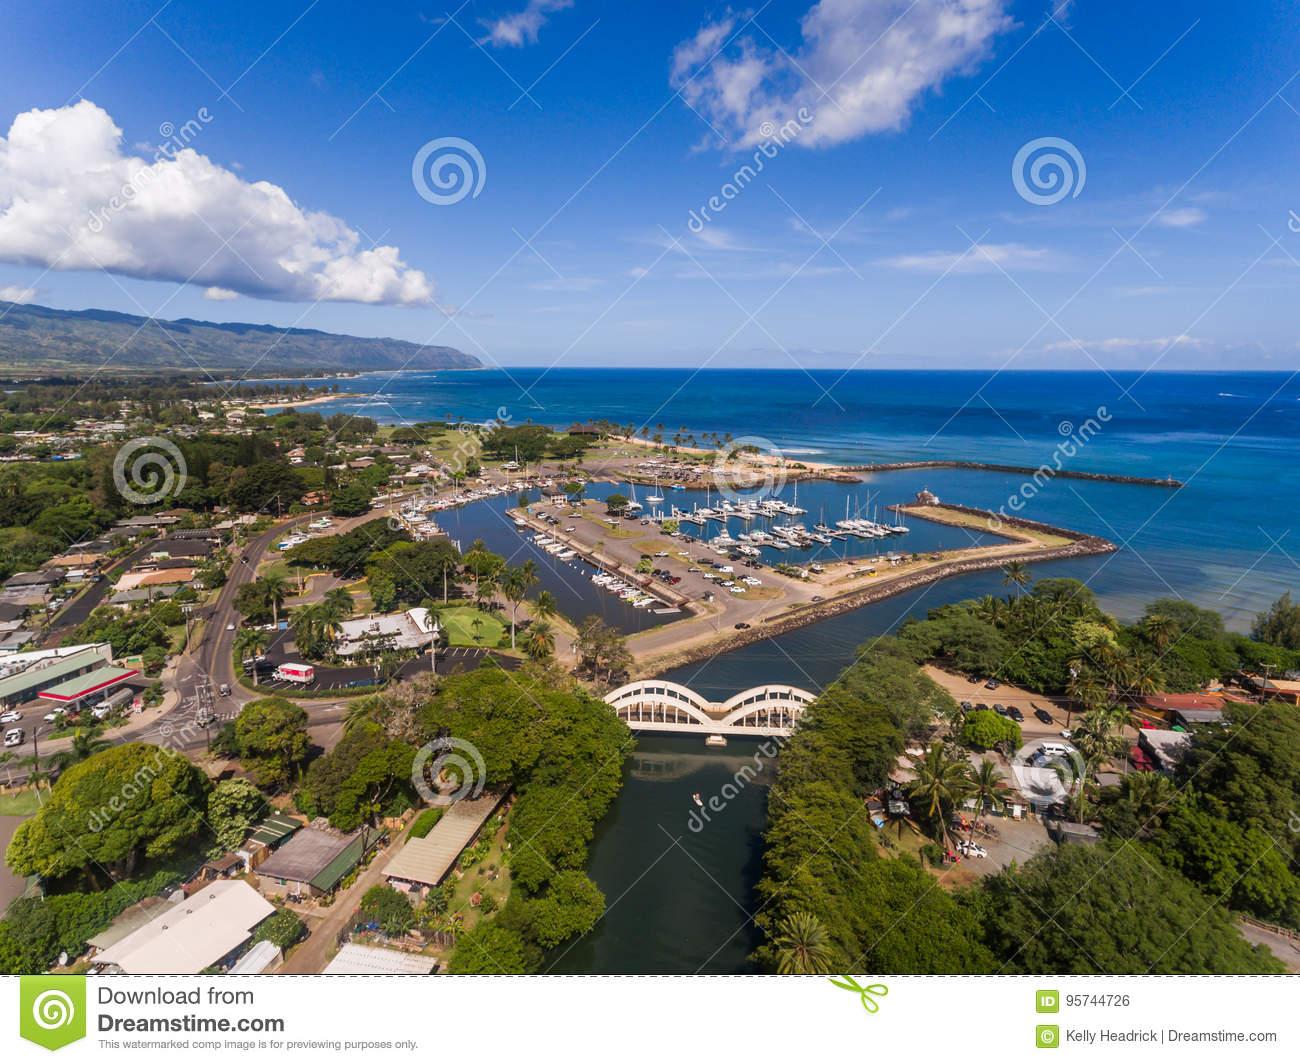 Name:  aerial-view-haleiwa-town-harbor-small-boat-anahulu-river-bridge-95744726.jpg Views: 544 Size:  241.9 KB